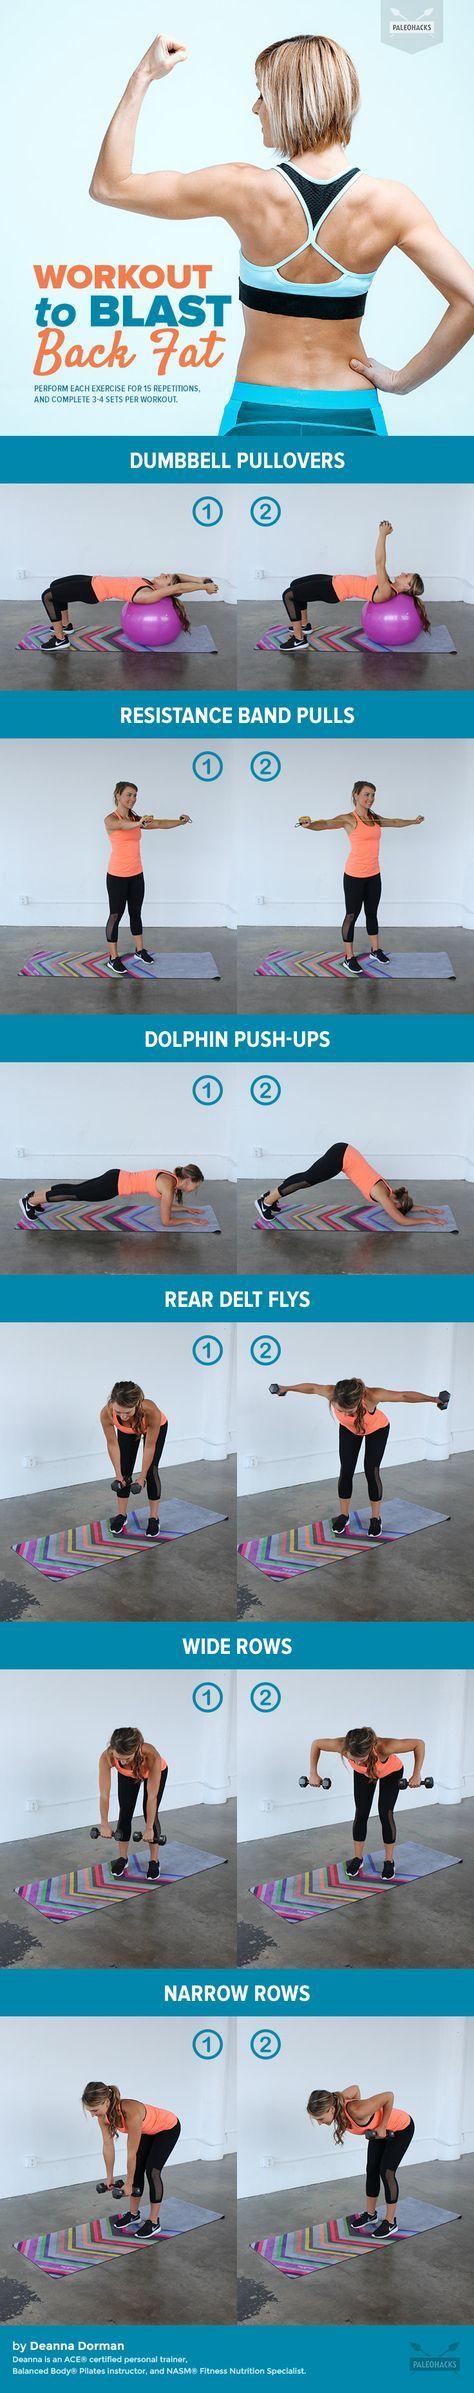 10 Best ideas about Armpit Fat Exercises on Pinterest ...